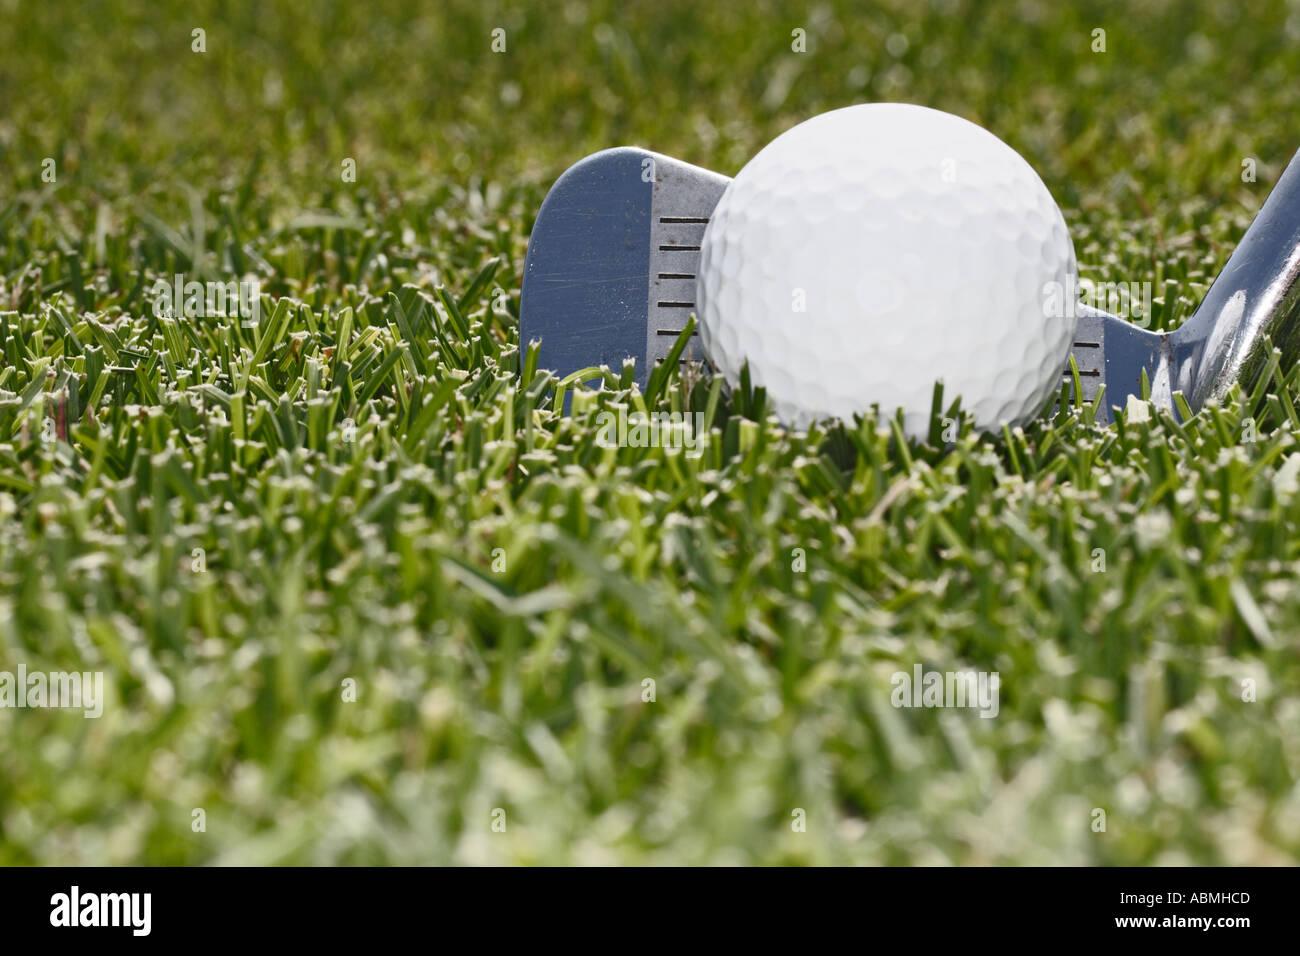 Close Up of Golf Club avec balle sur Fairway Photo Stock